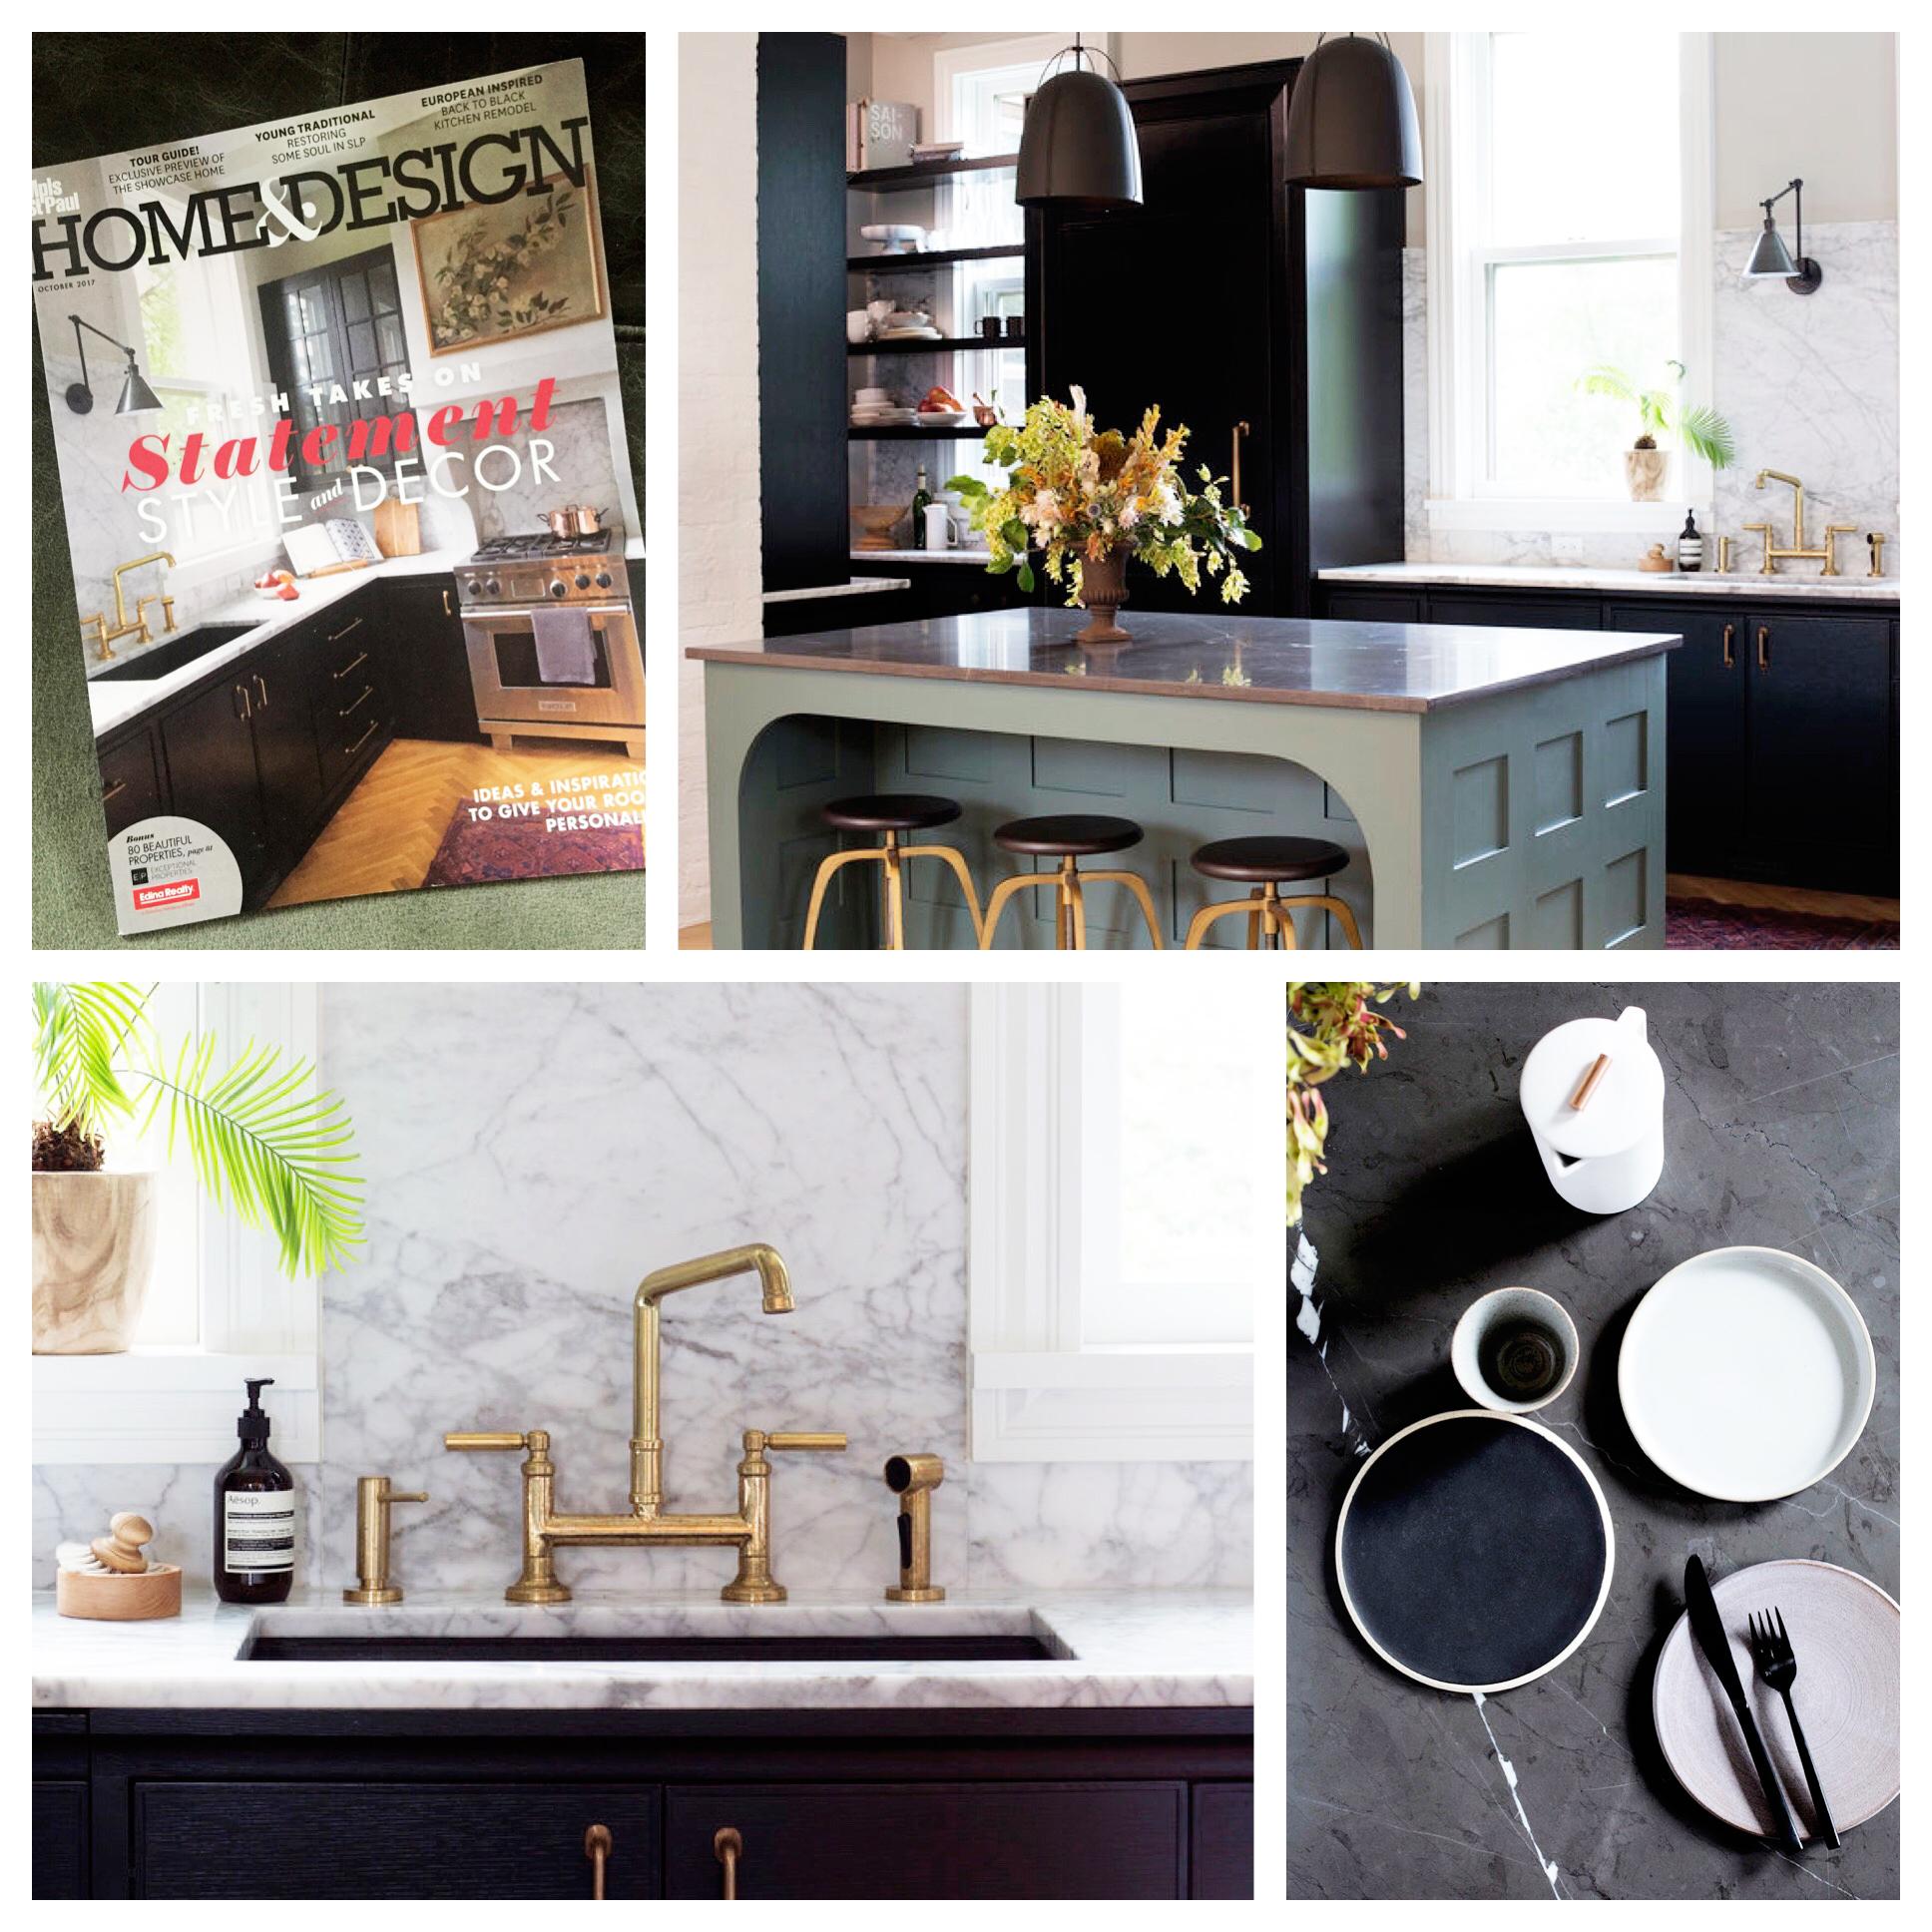 Home_Design_Mag_0368.jpeg